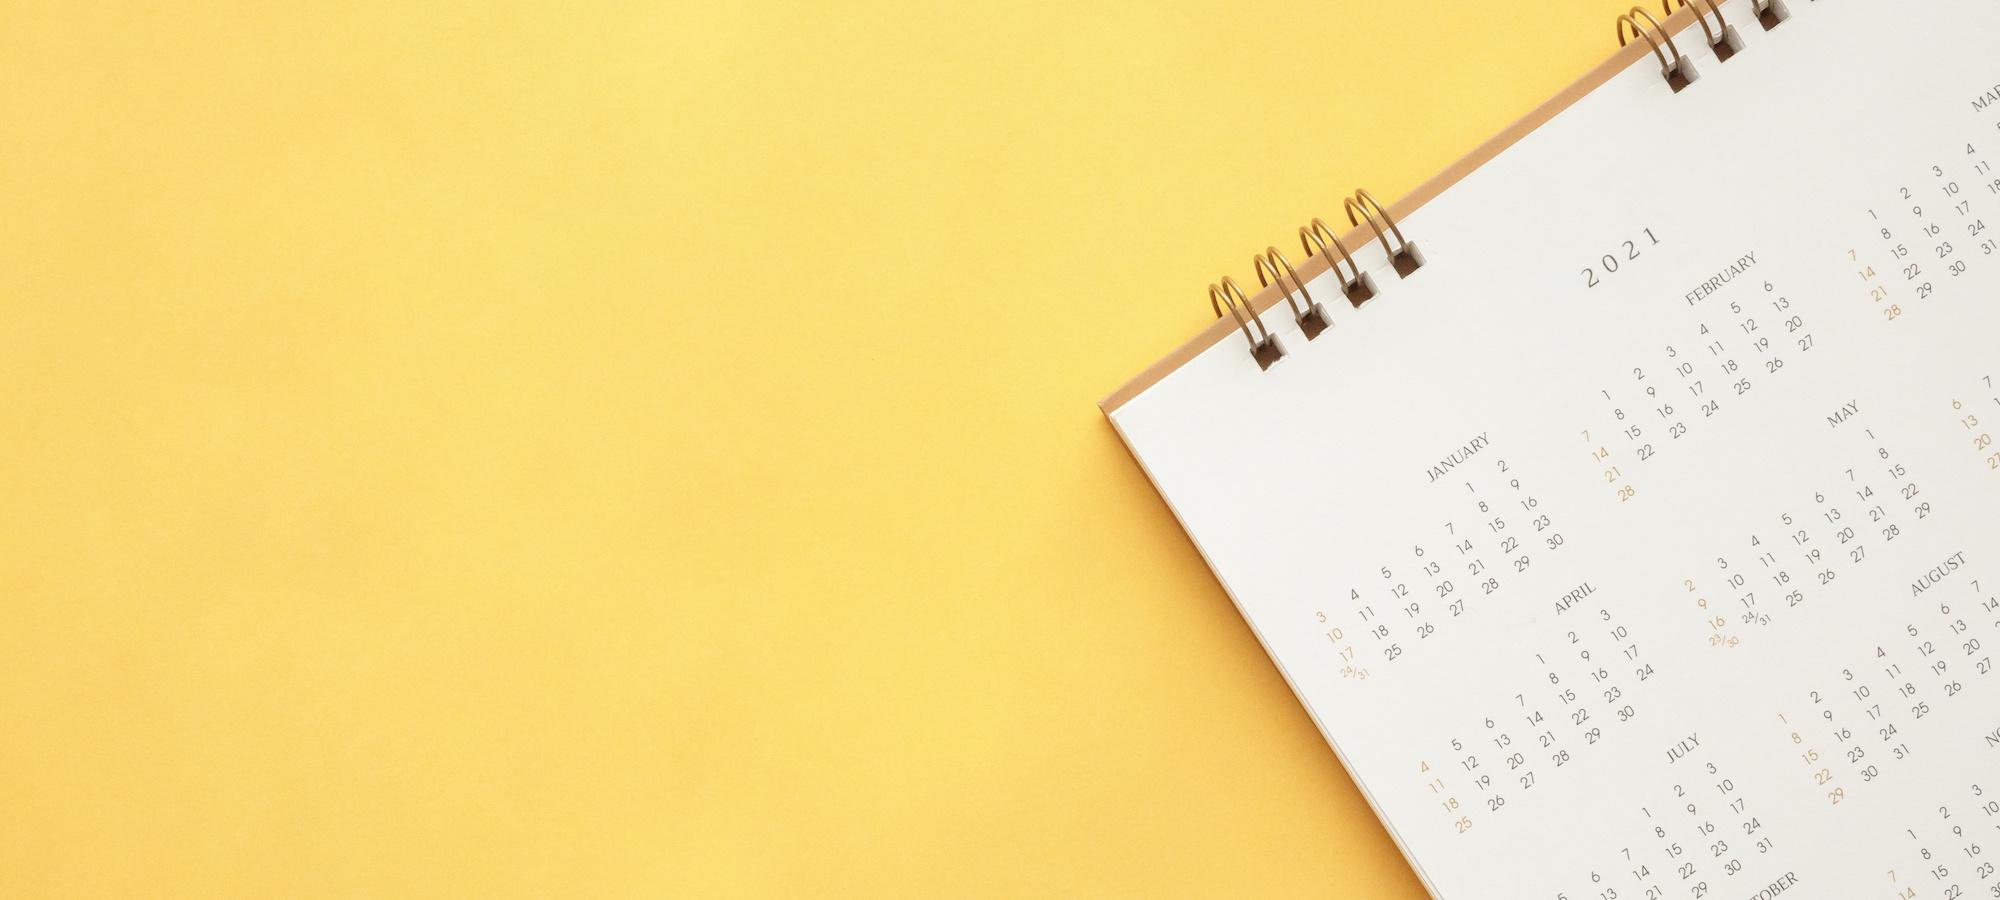 2021 calendar over a yellow background